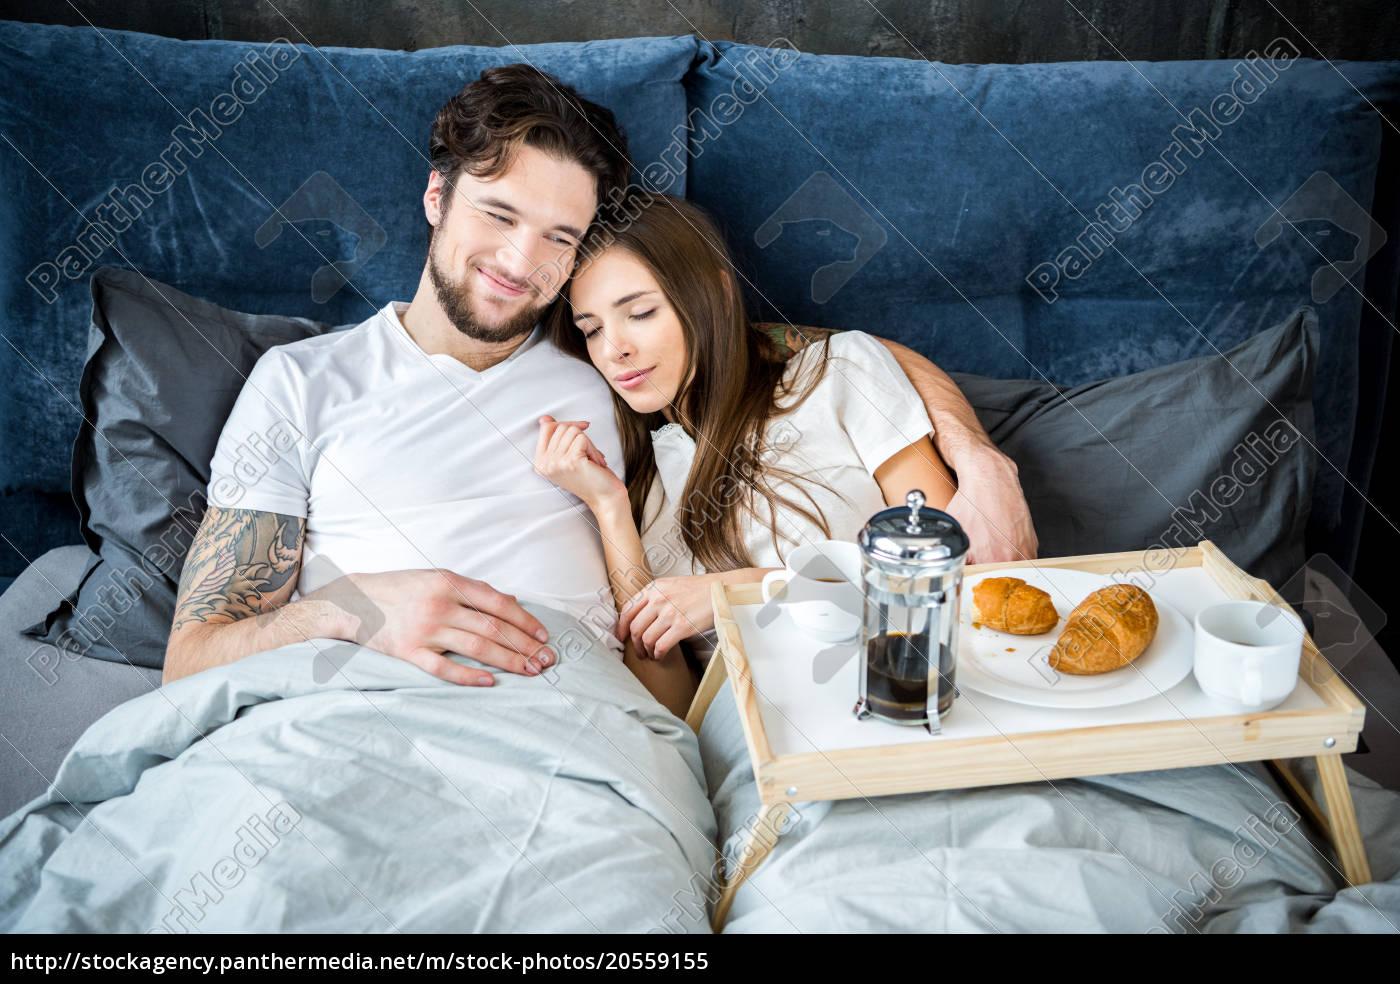 couple, has, breakfast, in, bed - 20559155